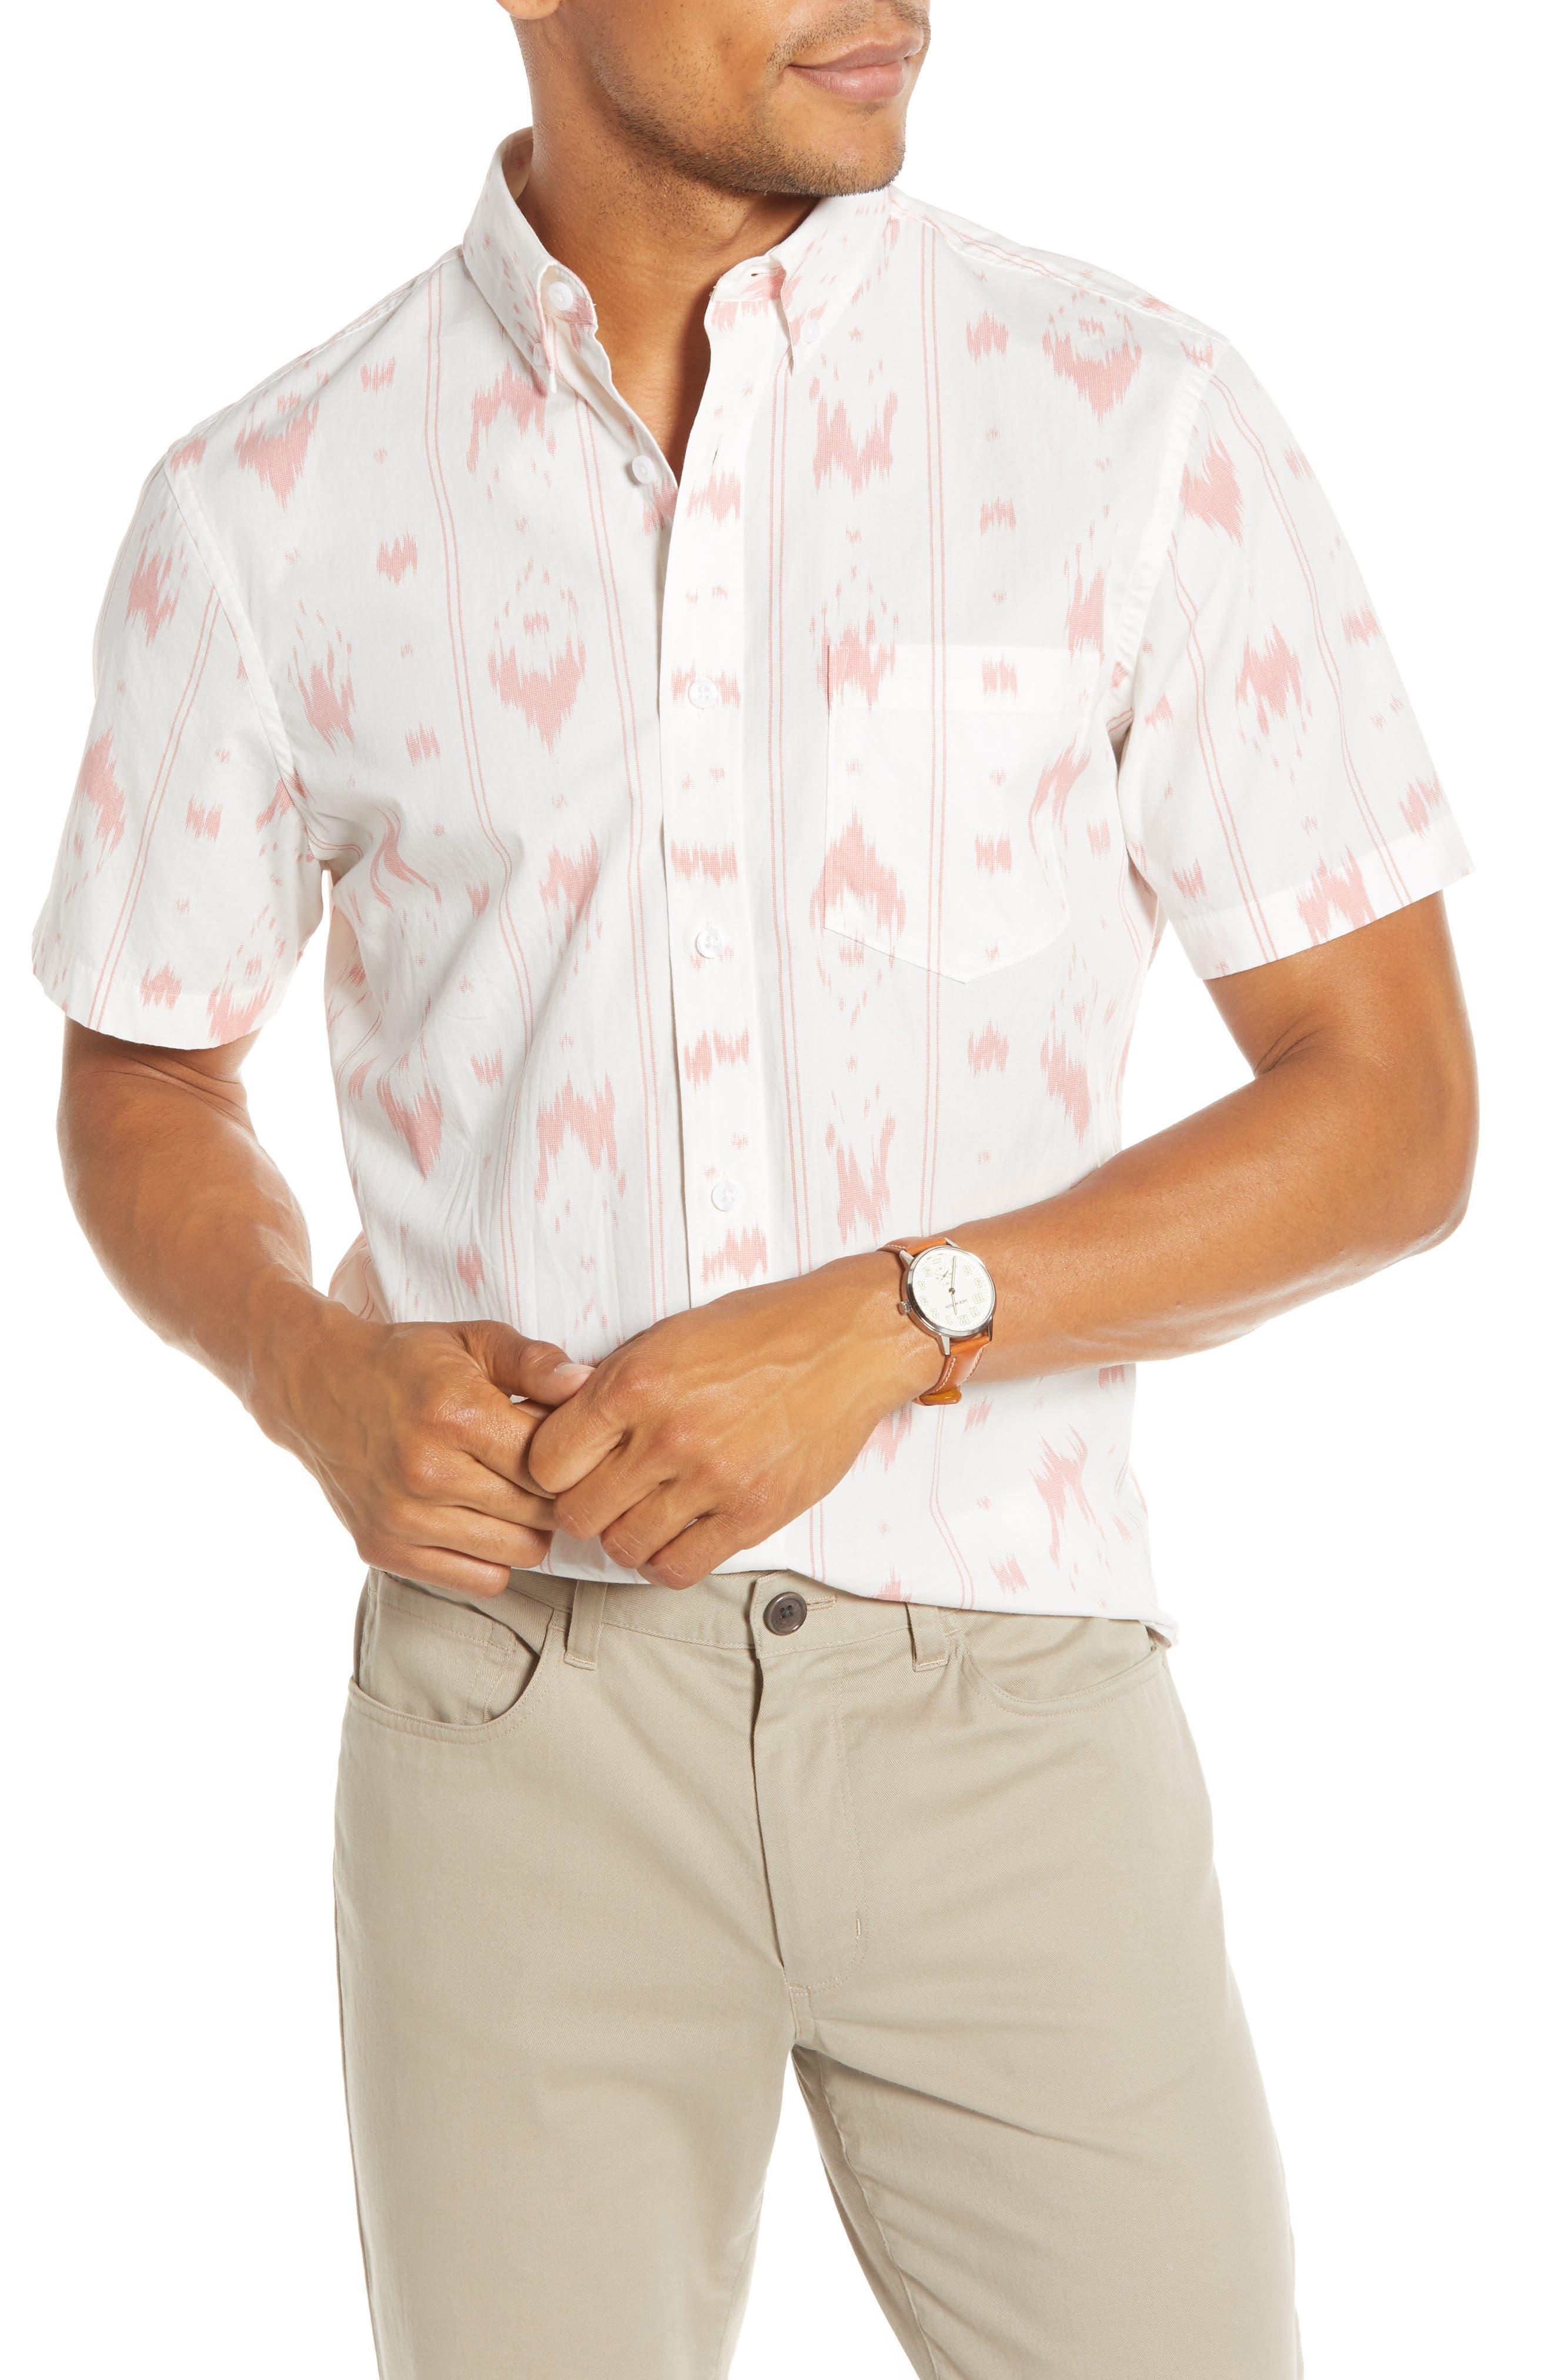 1901 Trim Fit Short Sleeve Button-Down Sport Shirt, Ivory